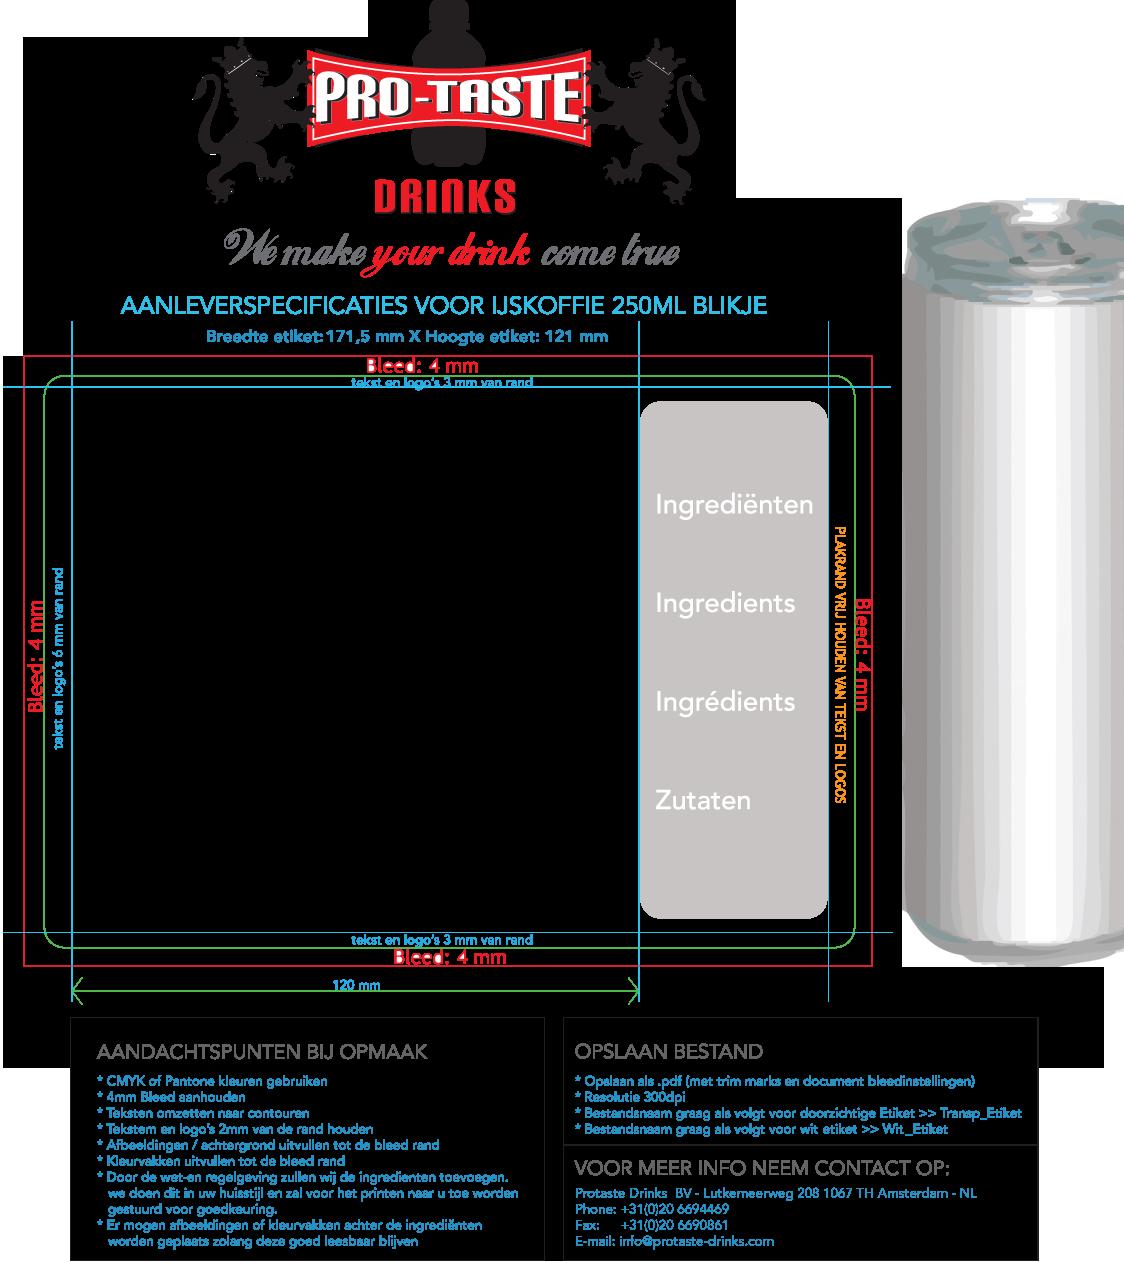 protaste aanleverspecificaties blikje ijskoffie